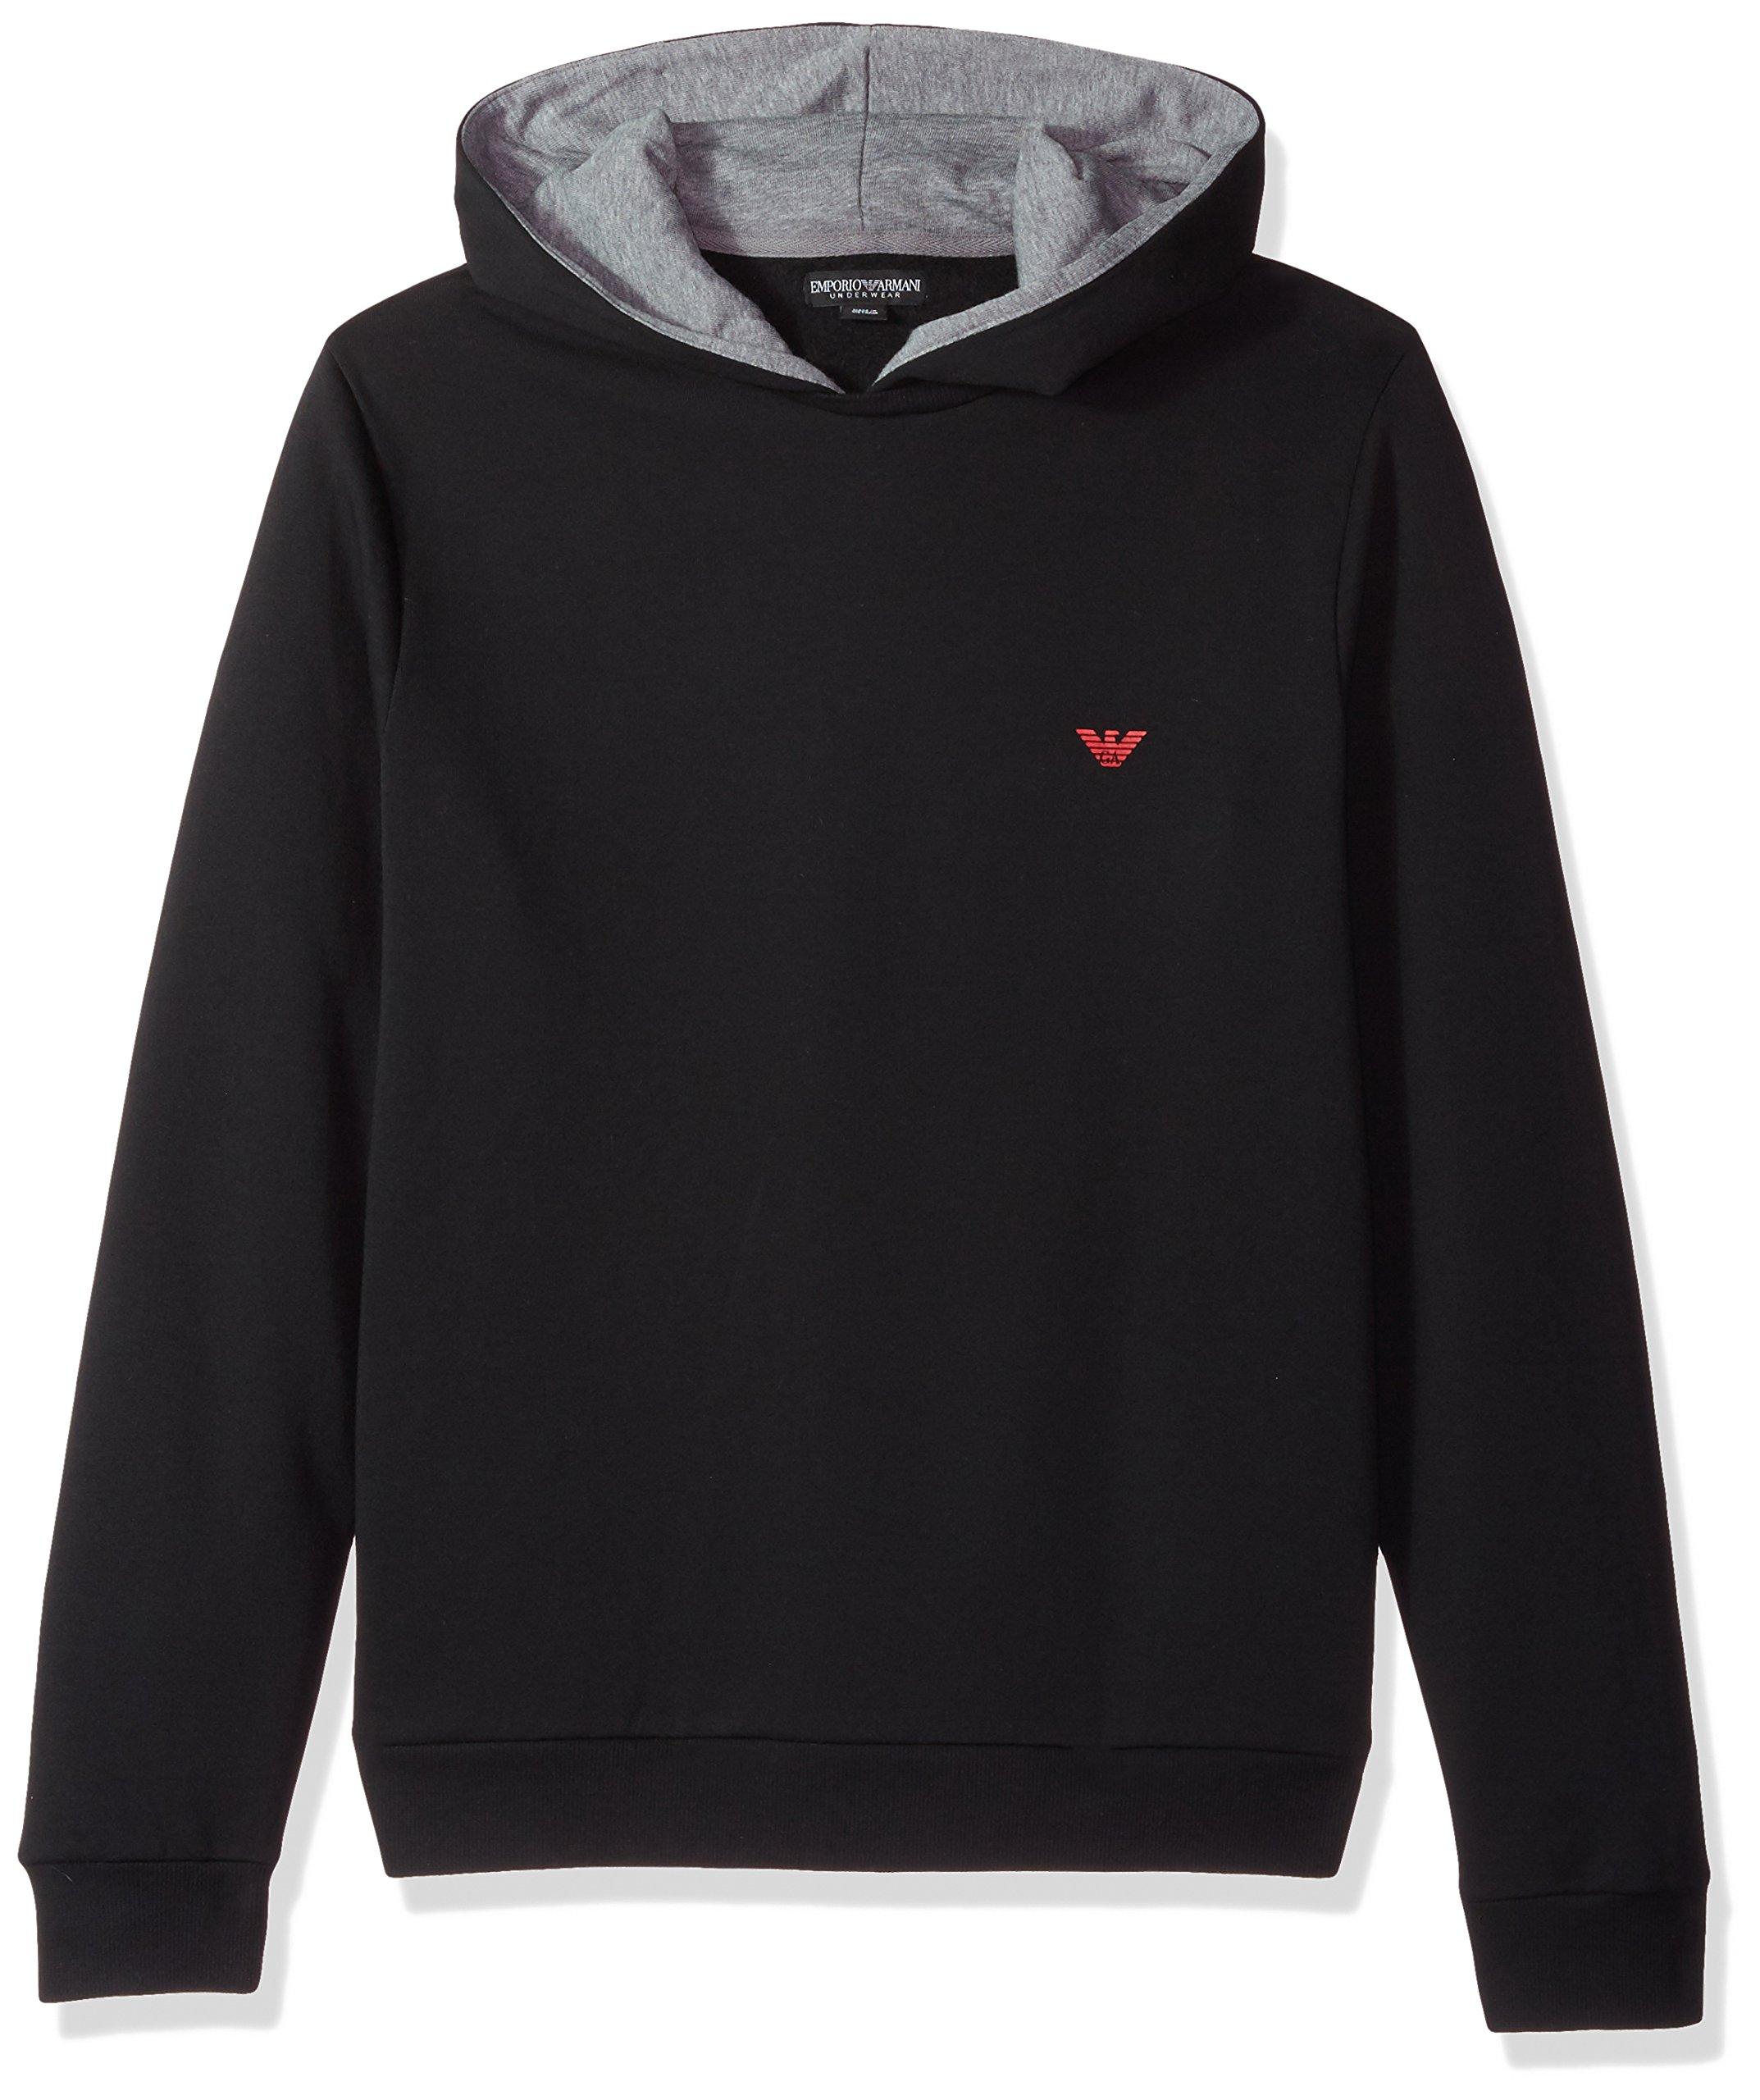 Emporio Armani Men's Basic French Terry Mock Hood Sweater, Black, L